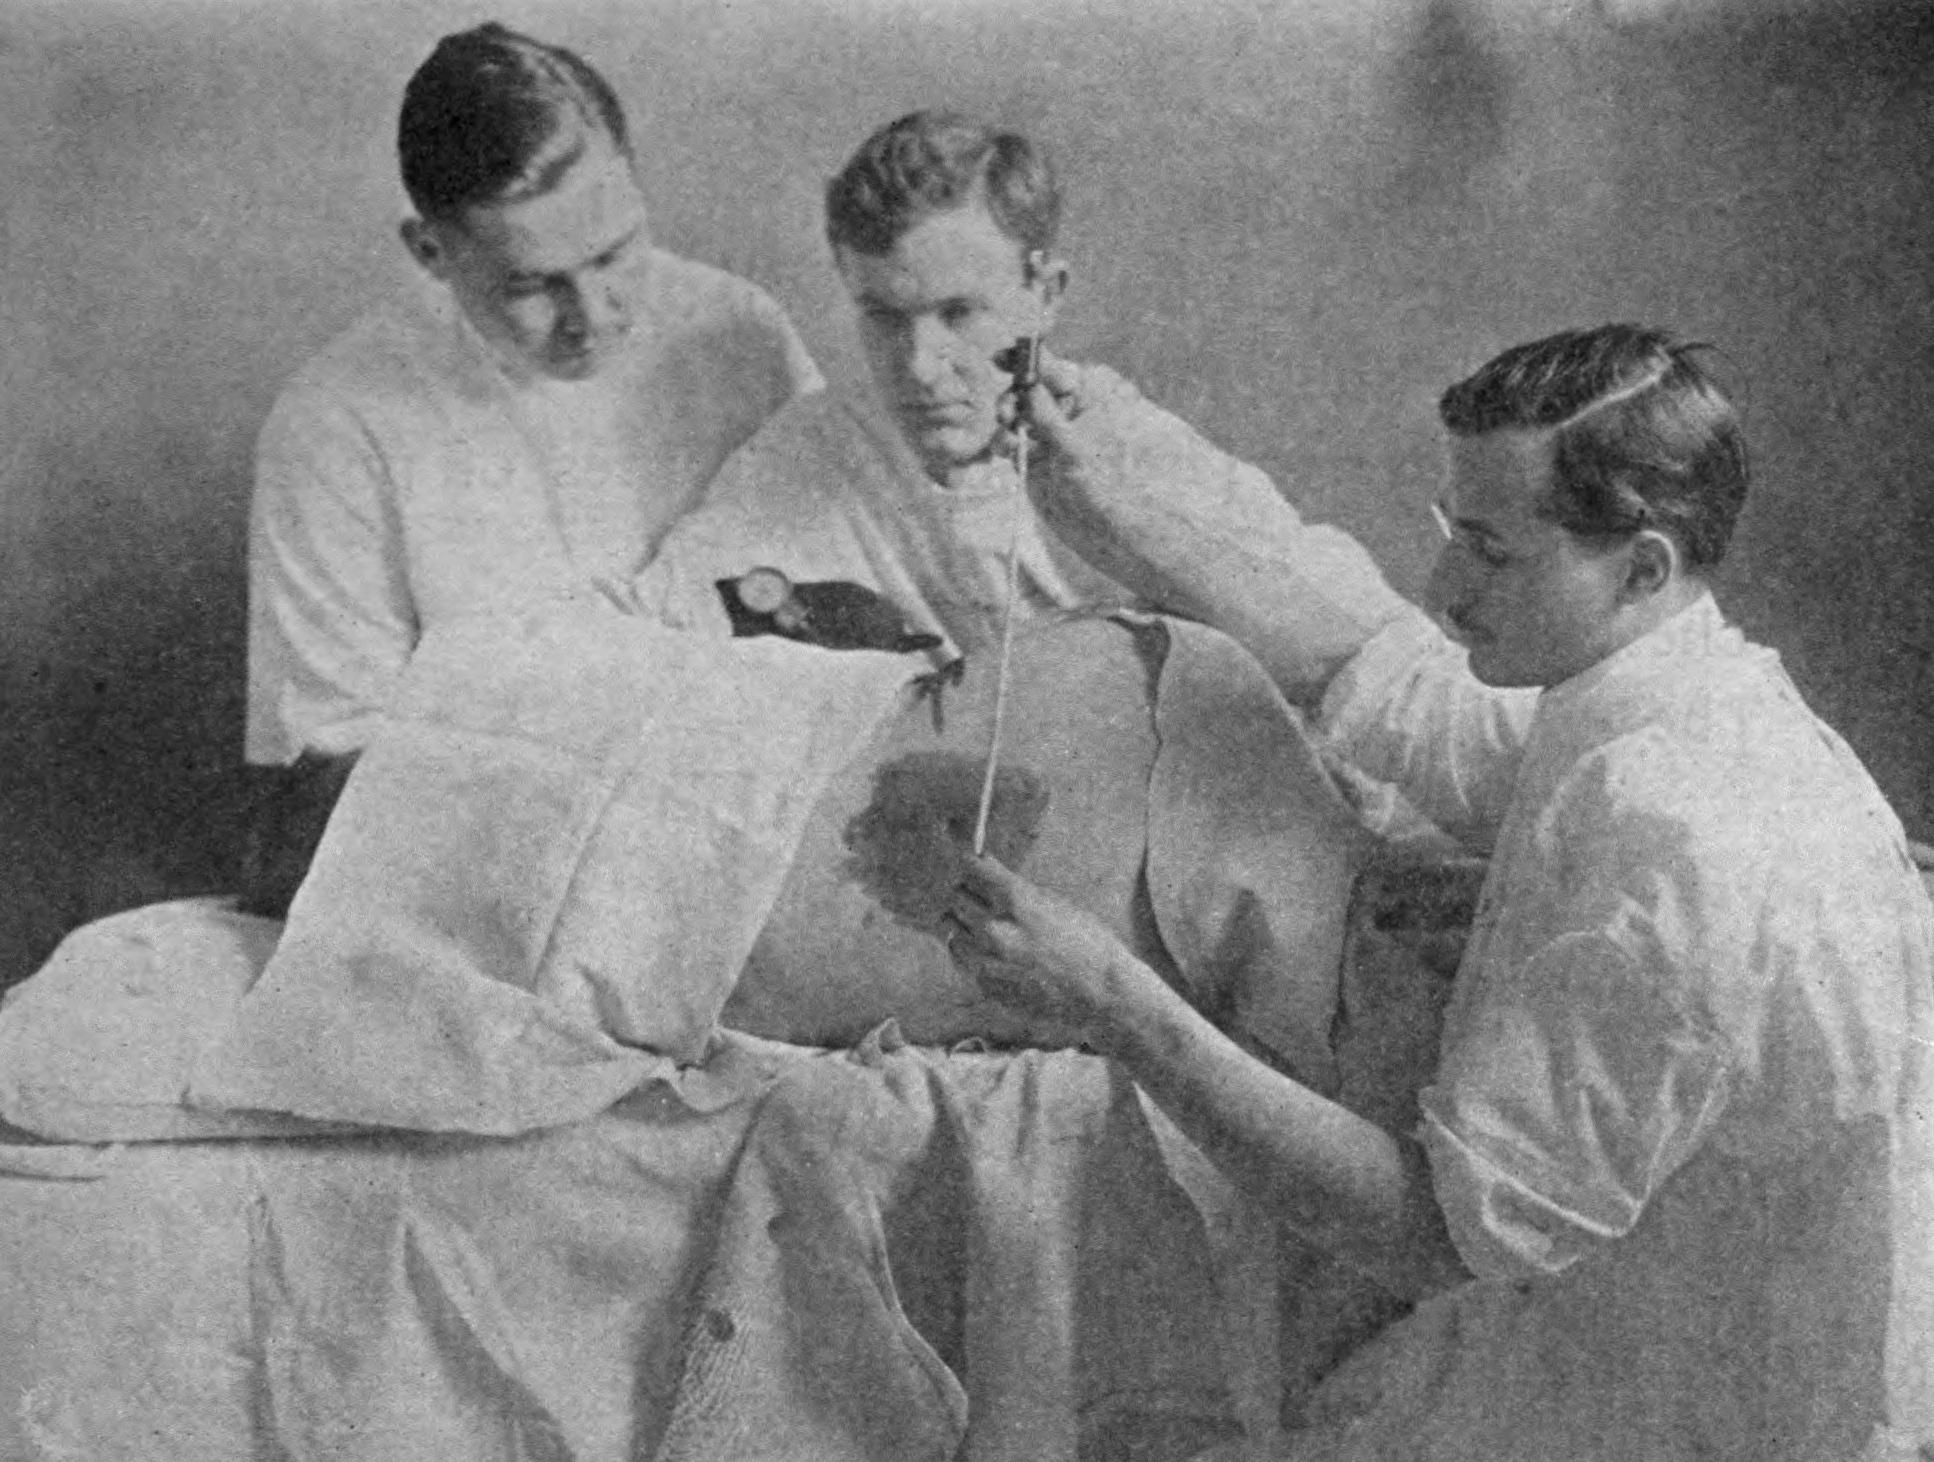 https://commons.wikimedia.org/wiki/File:Meningitis_-_Lumbar_puncture.jpg